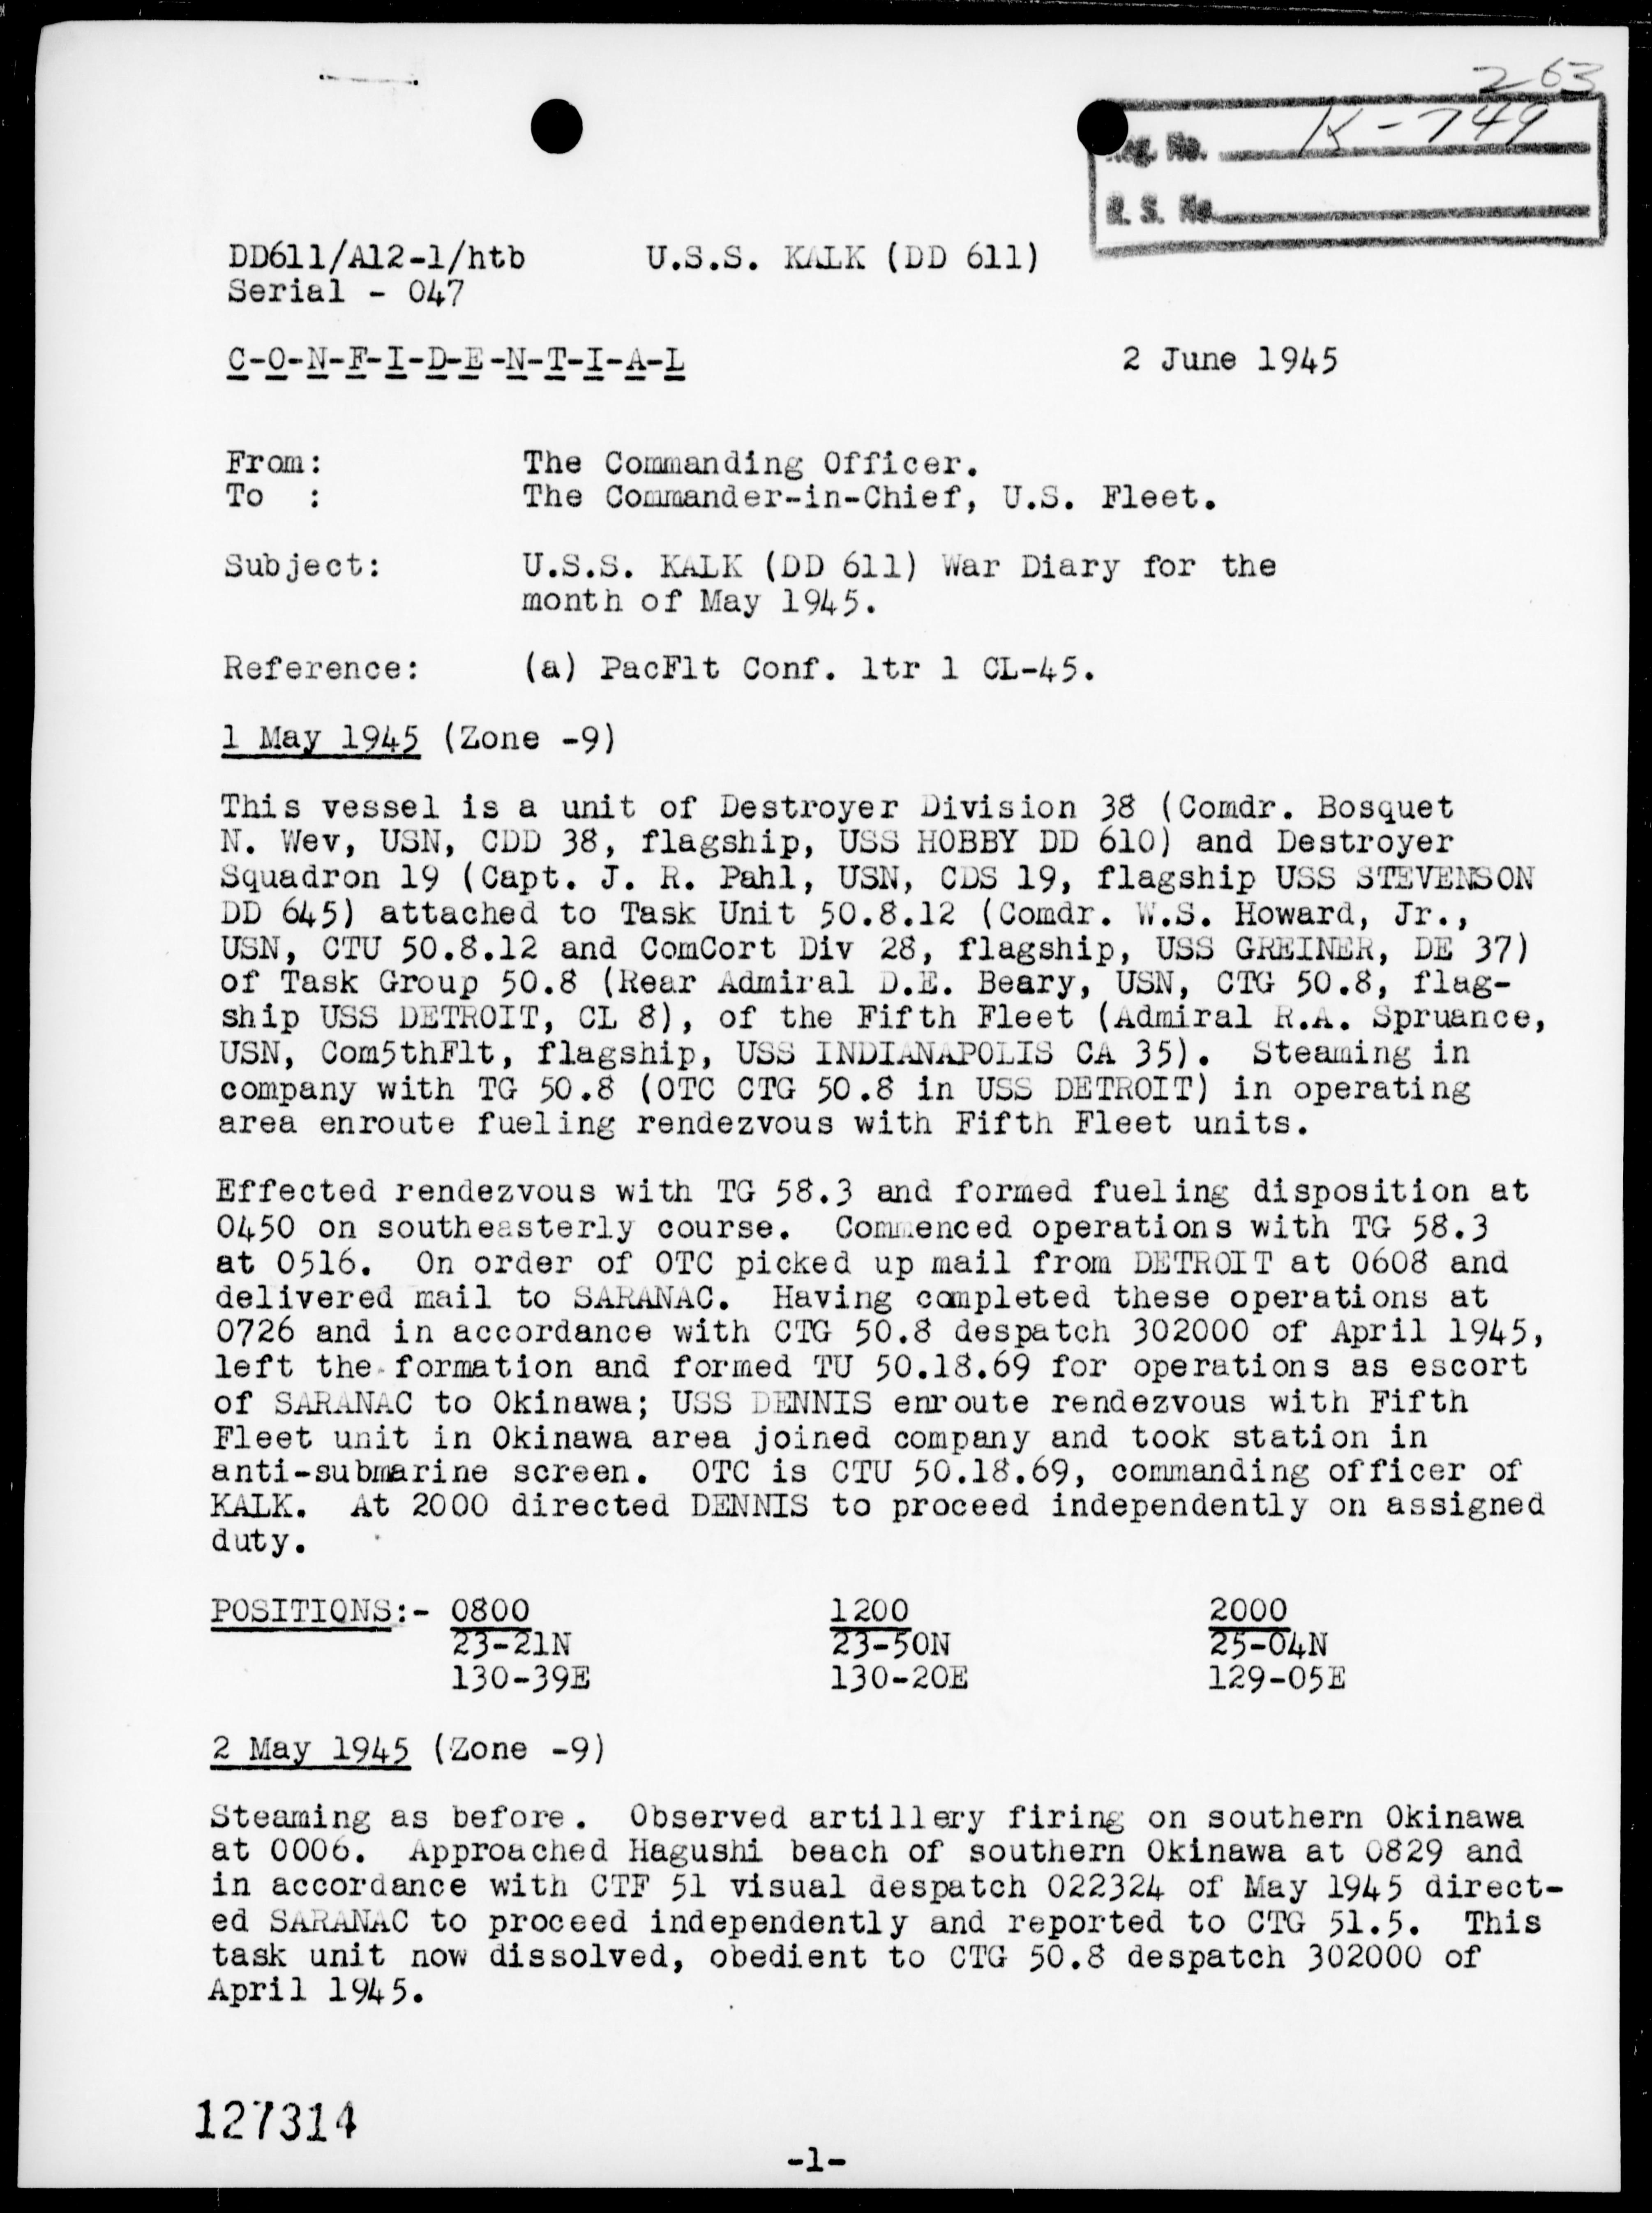 USS KALK - War Diary, 5/1-31/45